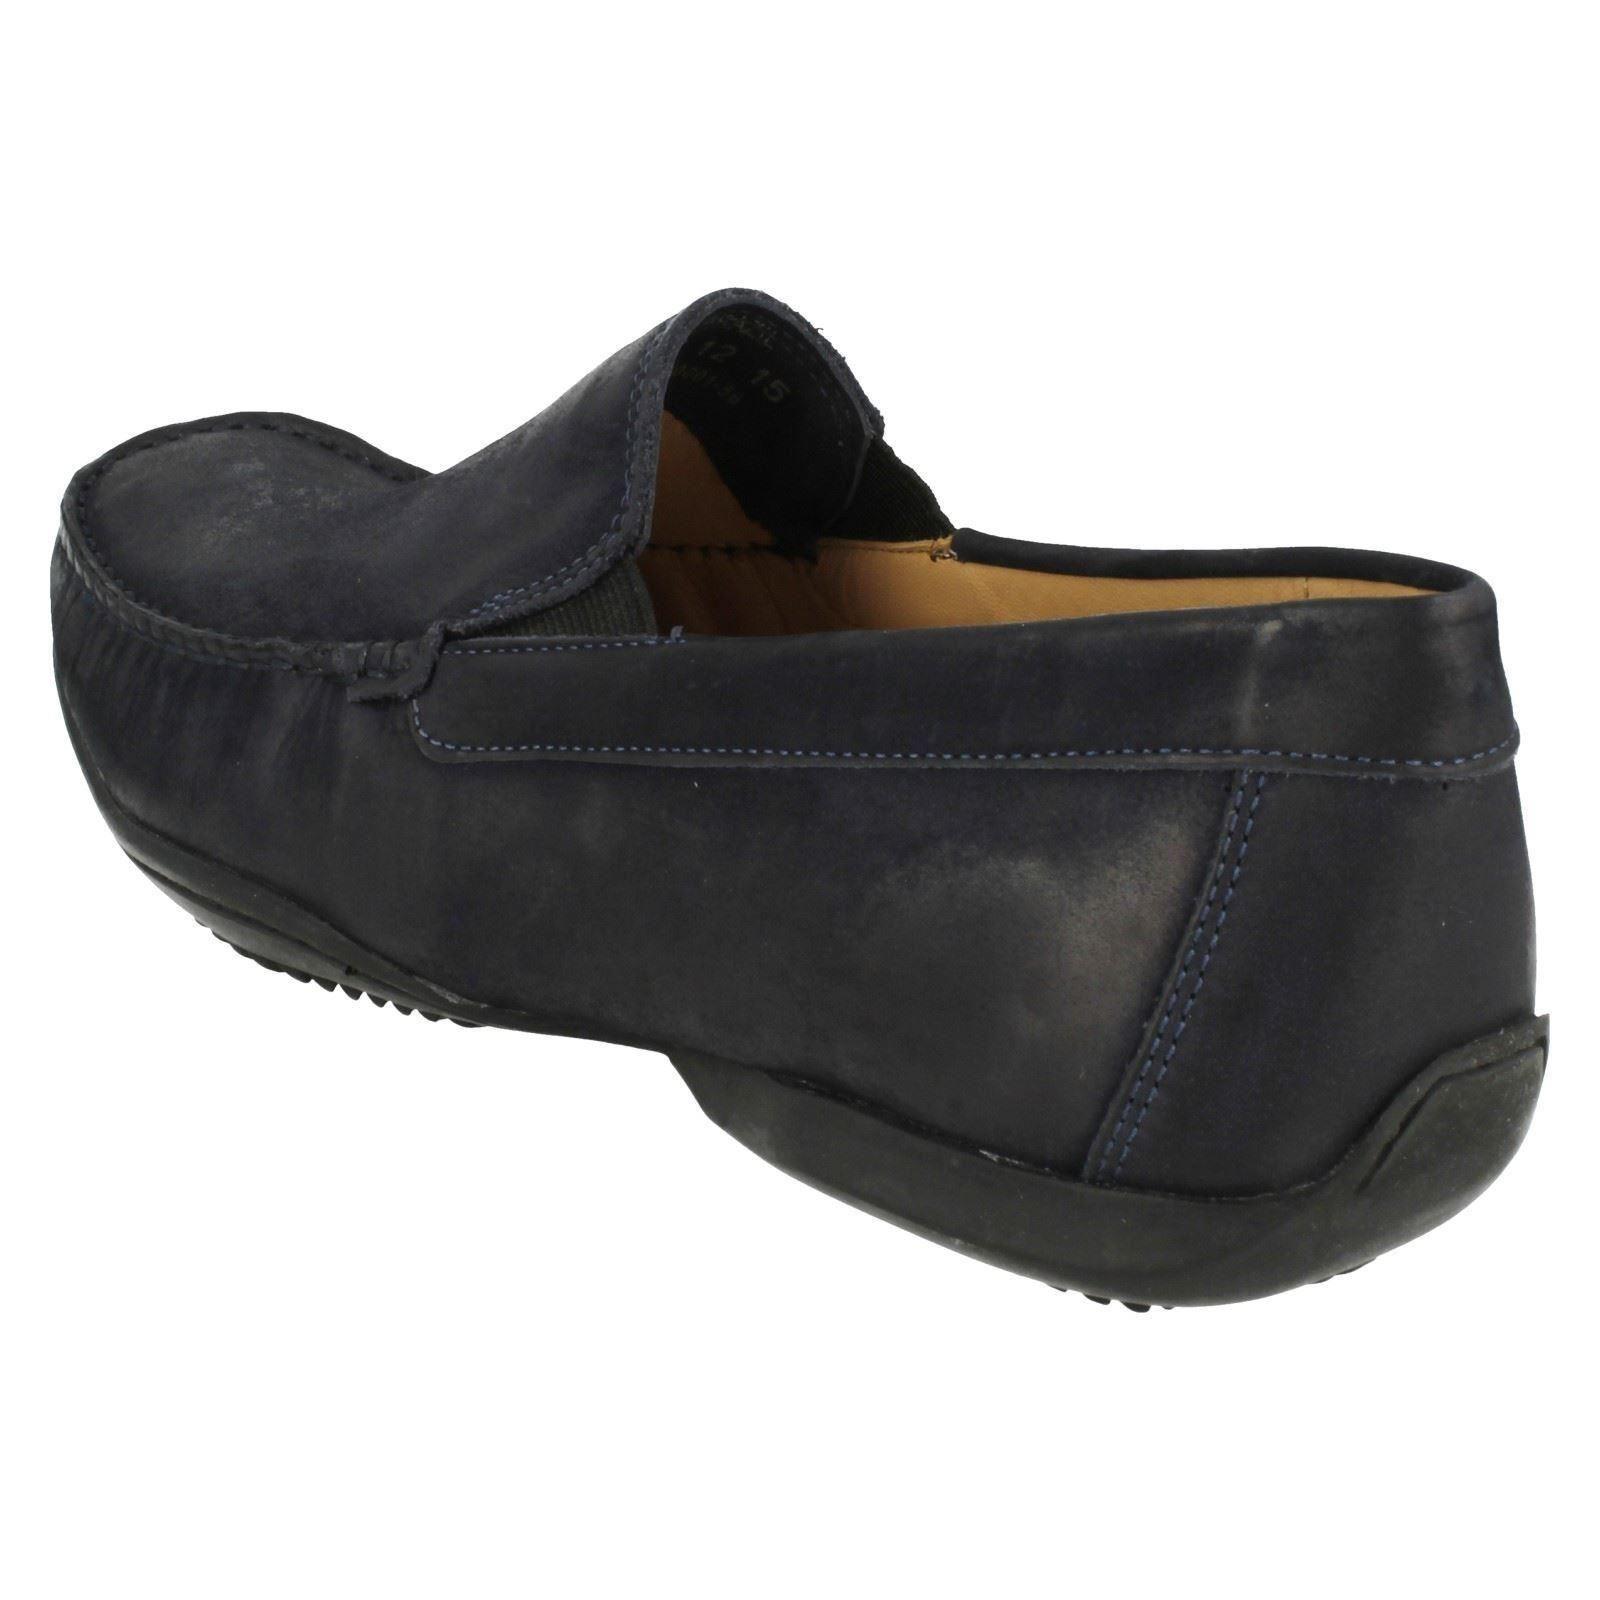 Billig gute Qualität Mens Anatomic Moccasin Schuhes Tavares